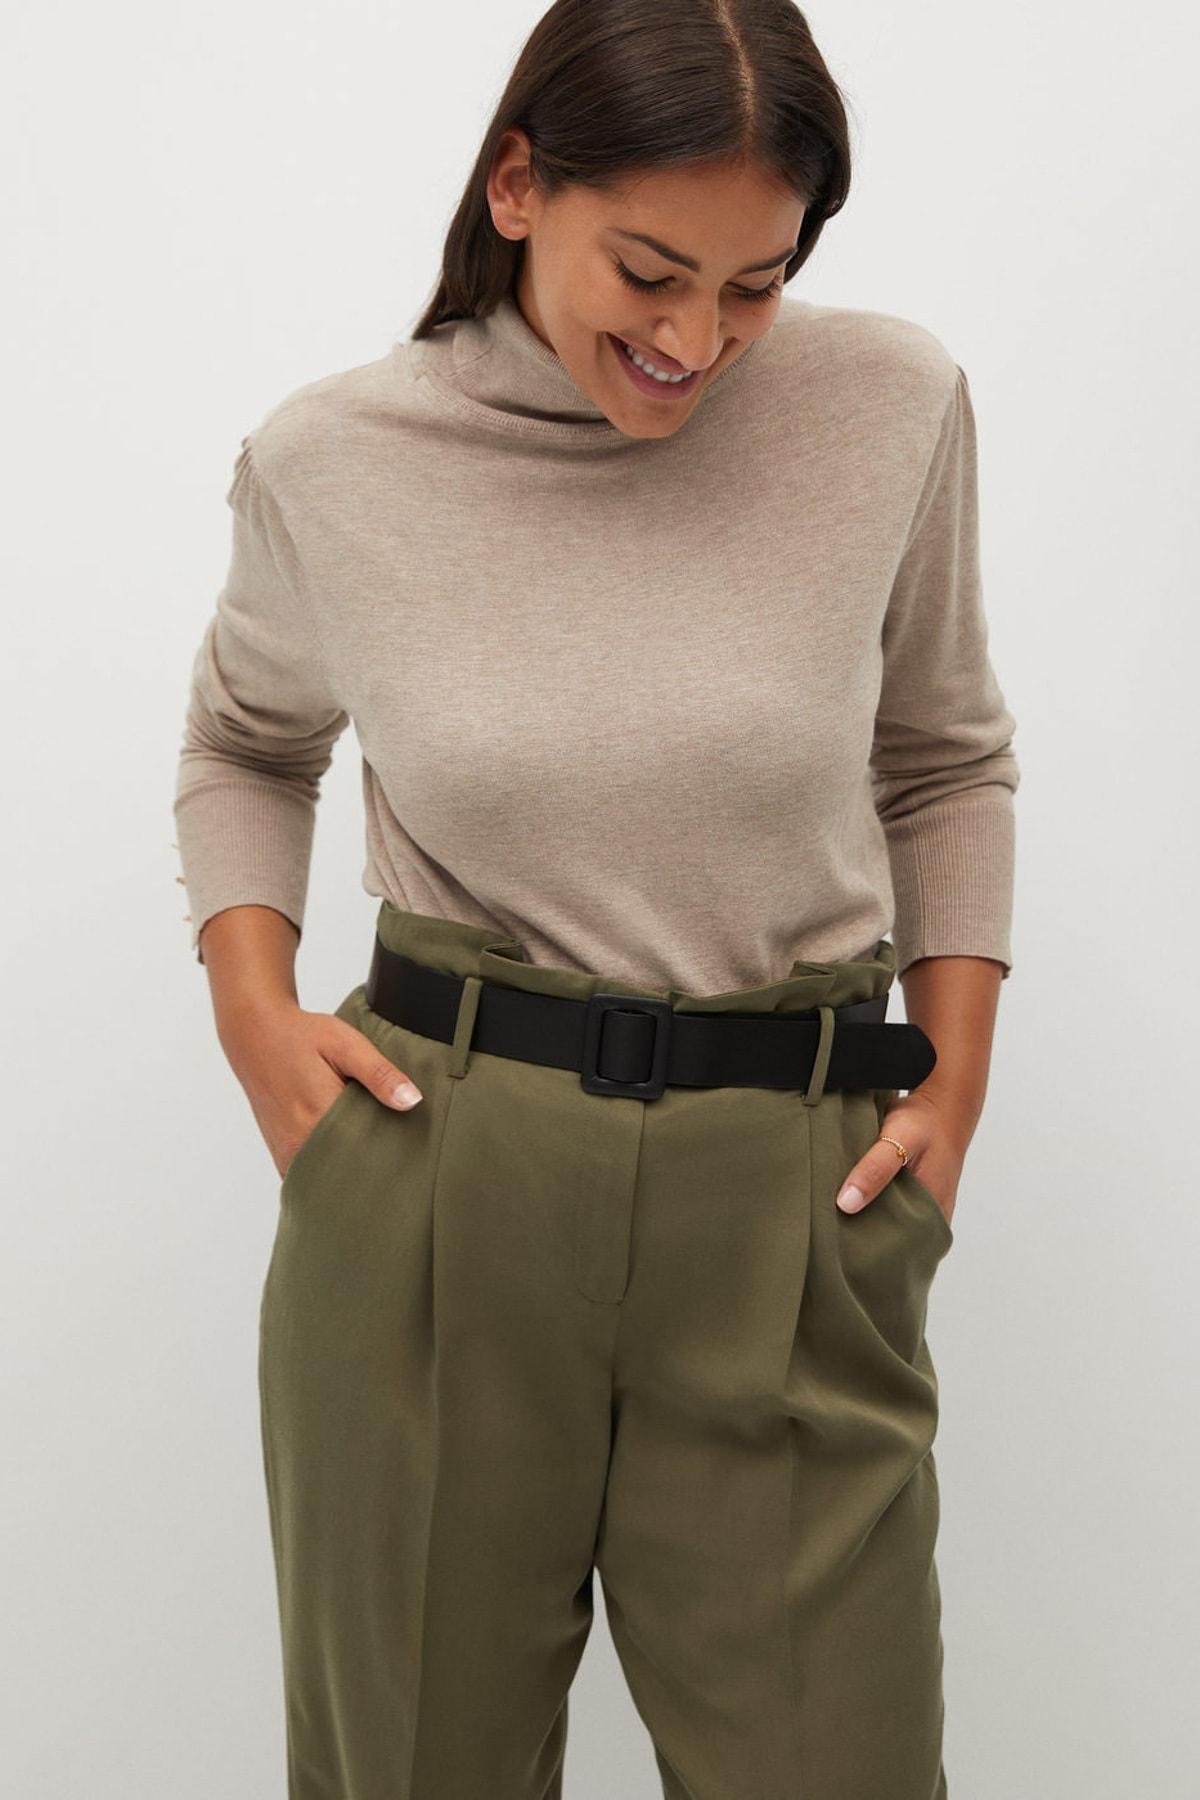 Violeta by MANGO Kadın Haki Renk Daralan Kısa Paçalı Pantolon 77067110 1